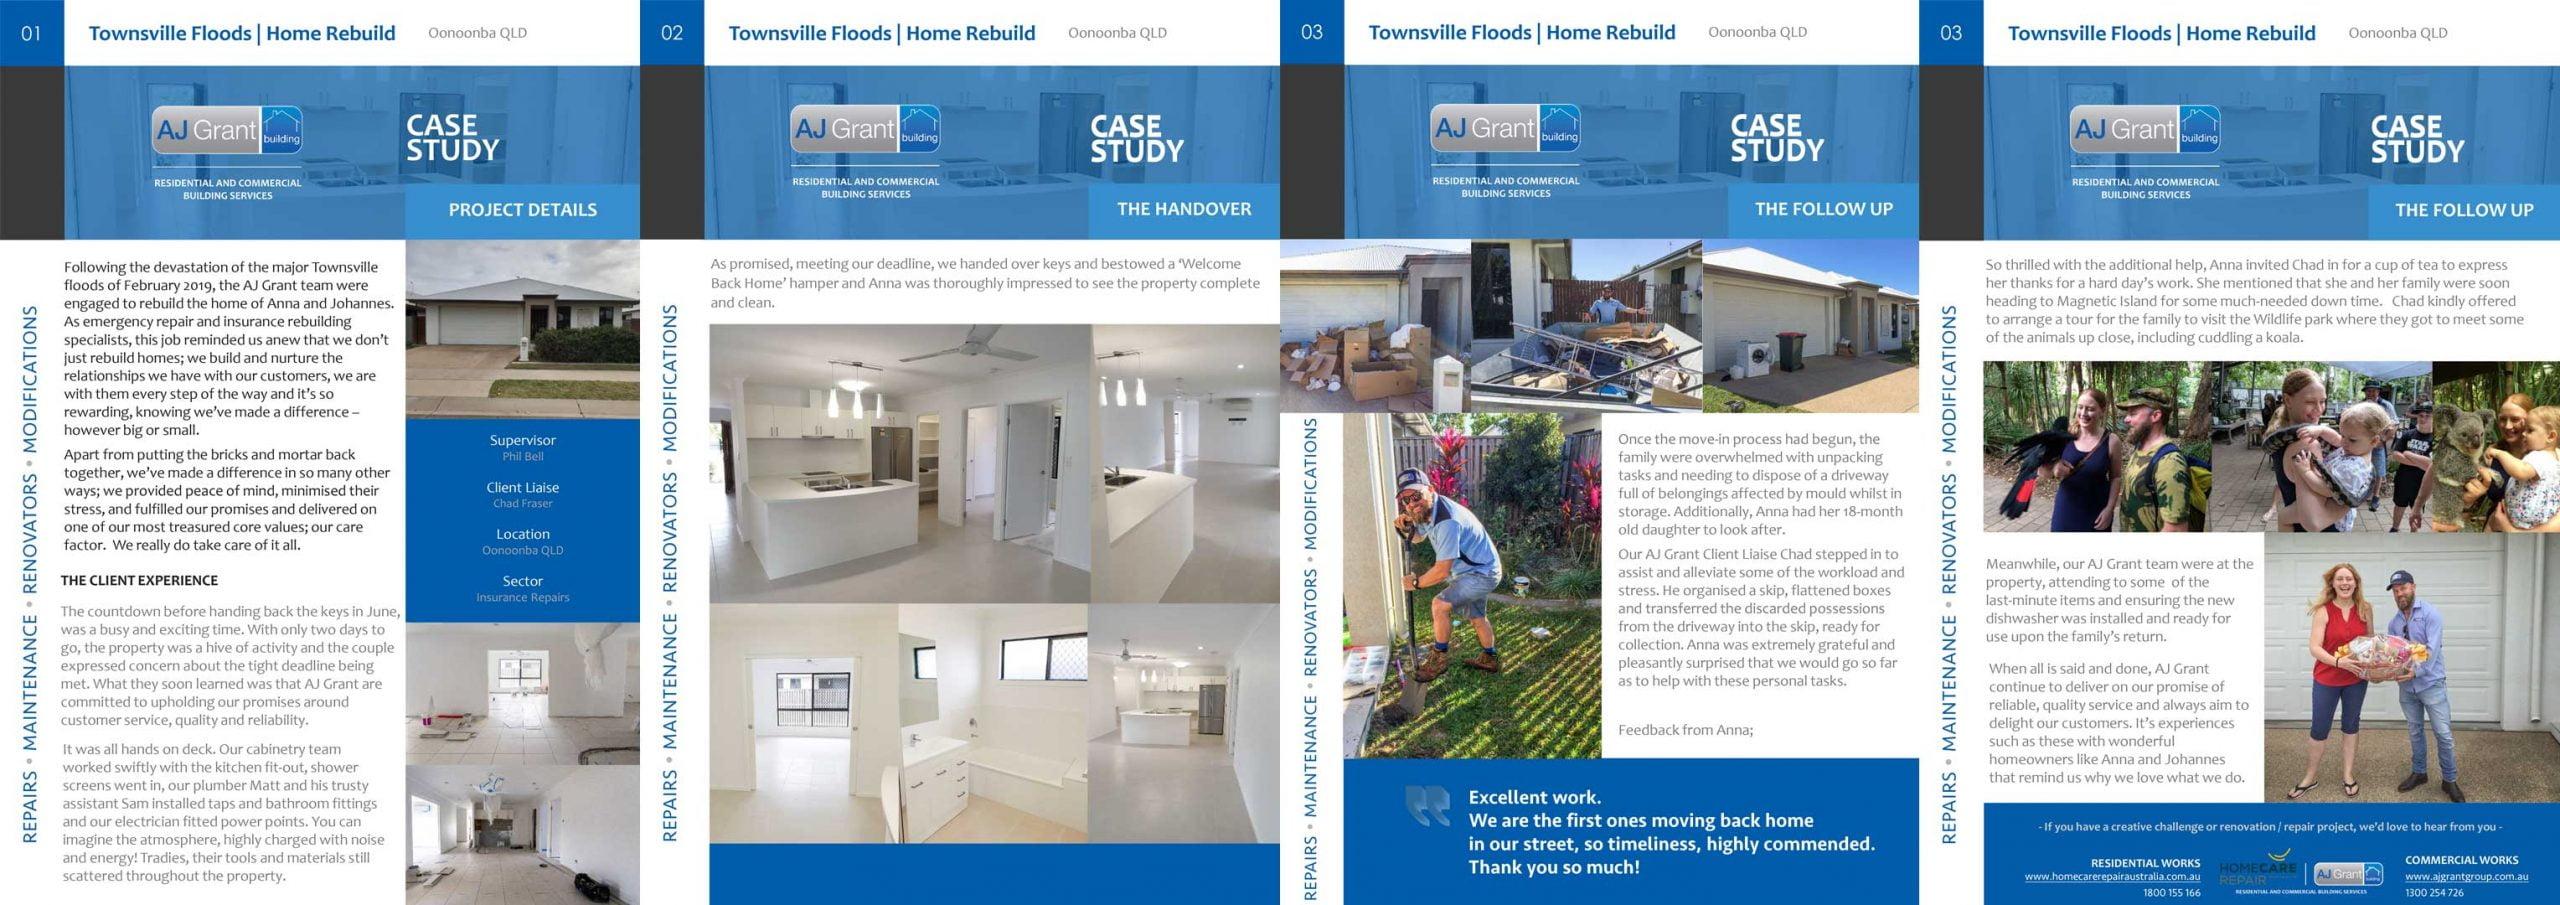 Townsville Floods Rebuild Oonoonba